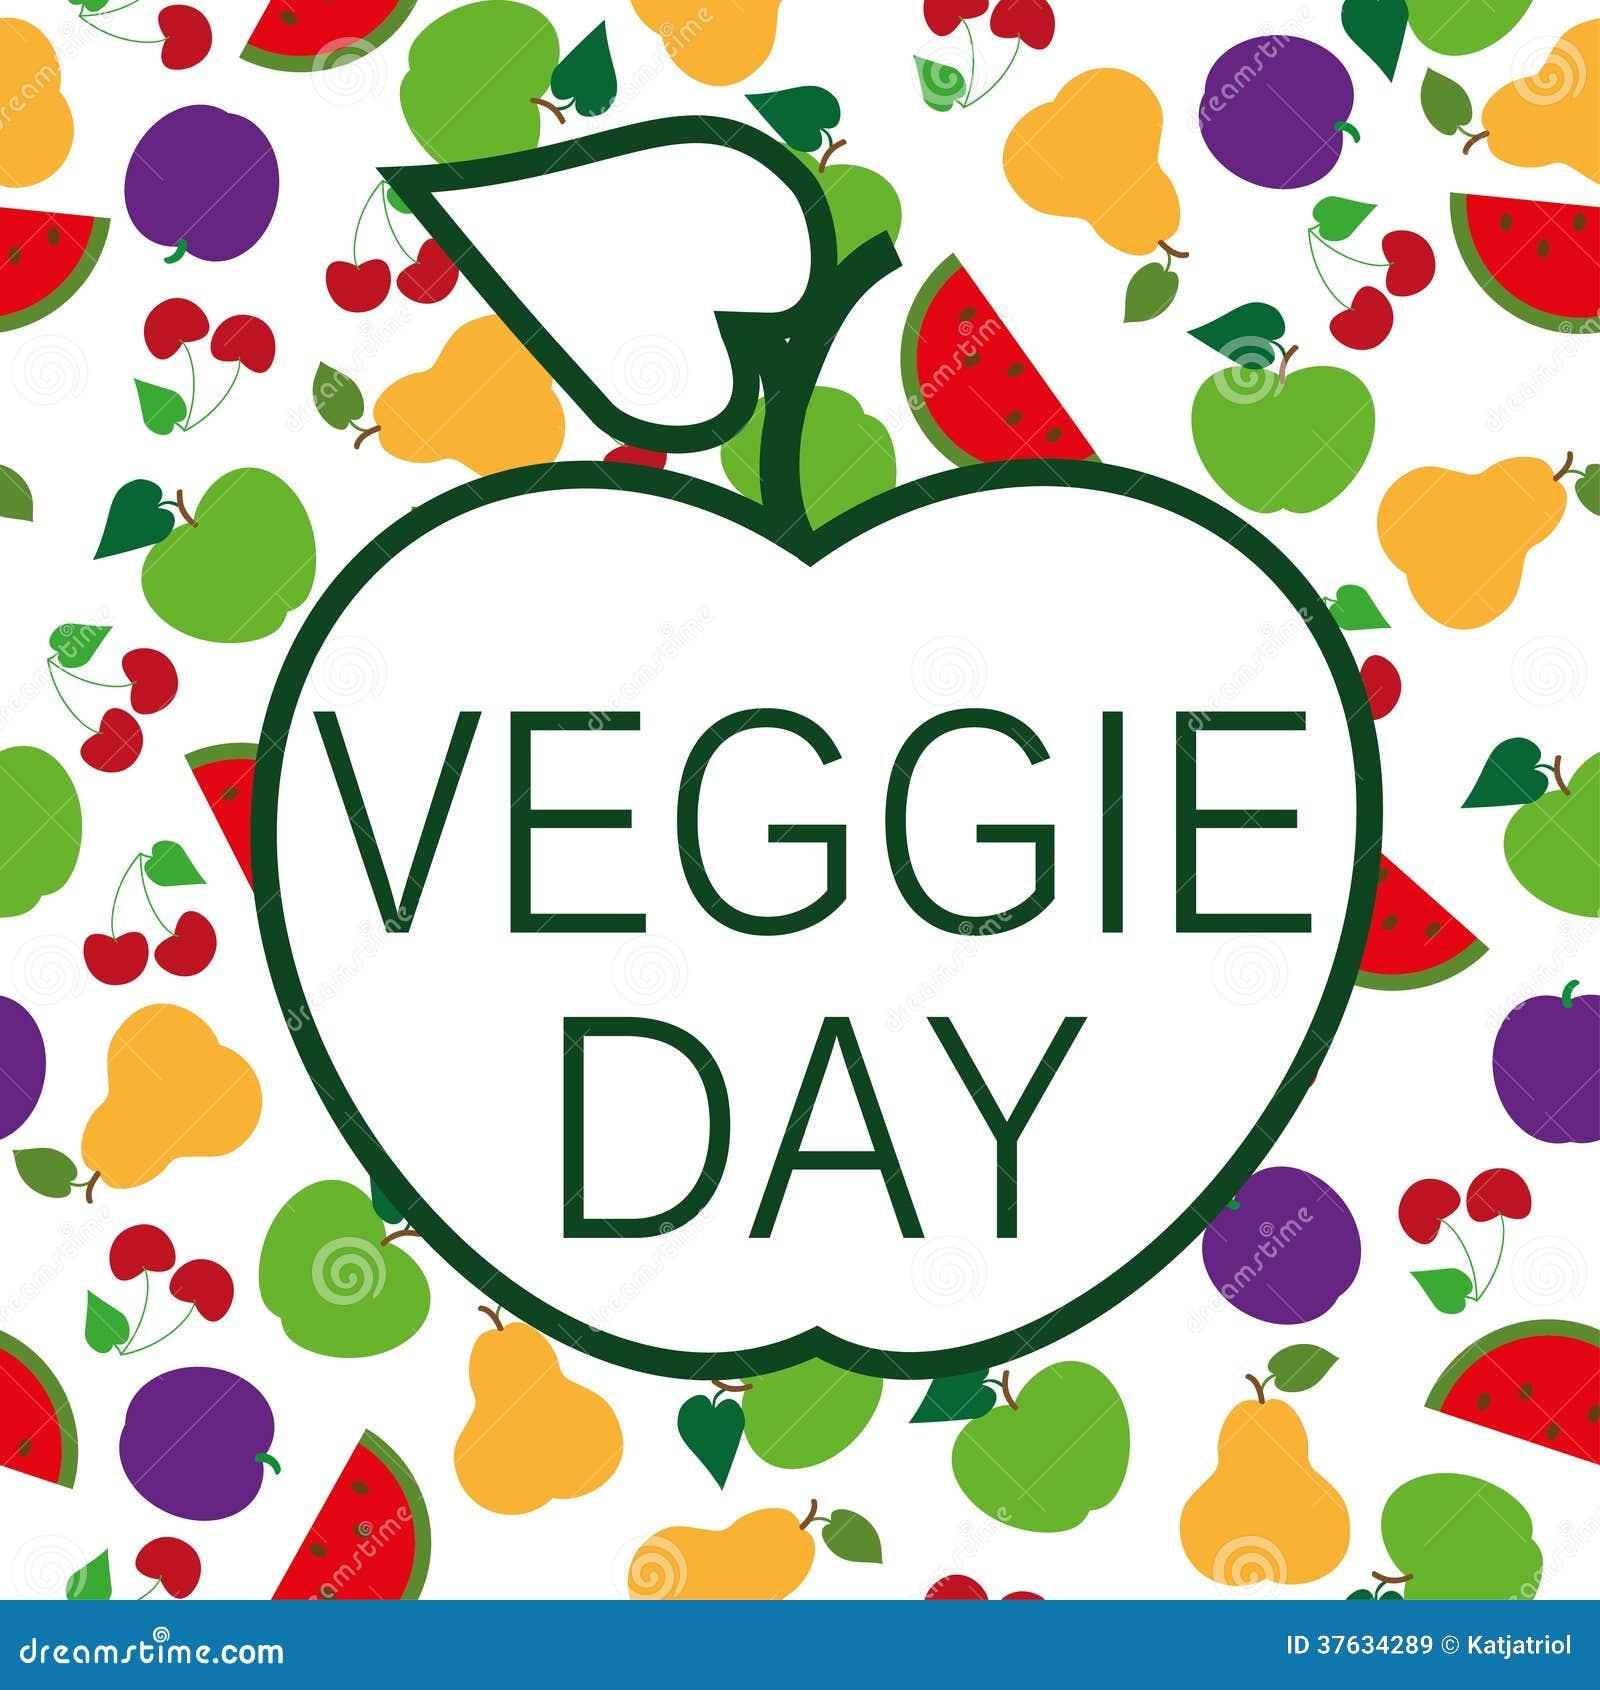 veggie day royalty free stock images image 37634289 fruit basket clipart images empty fruit basket clipart